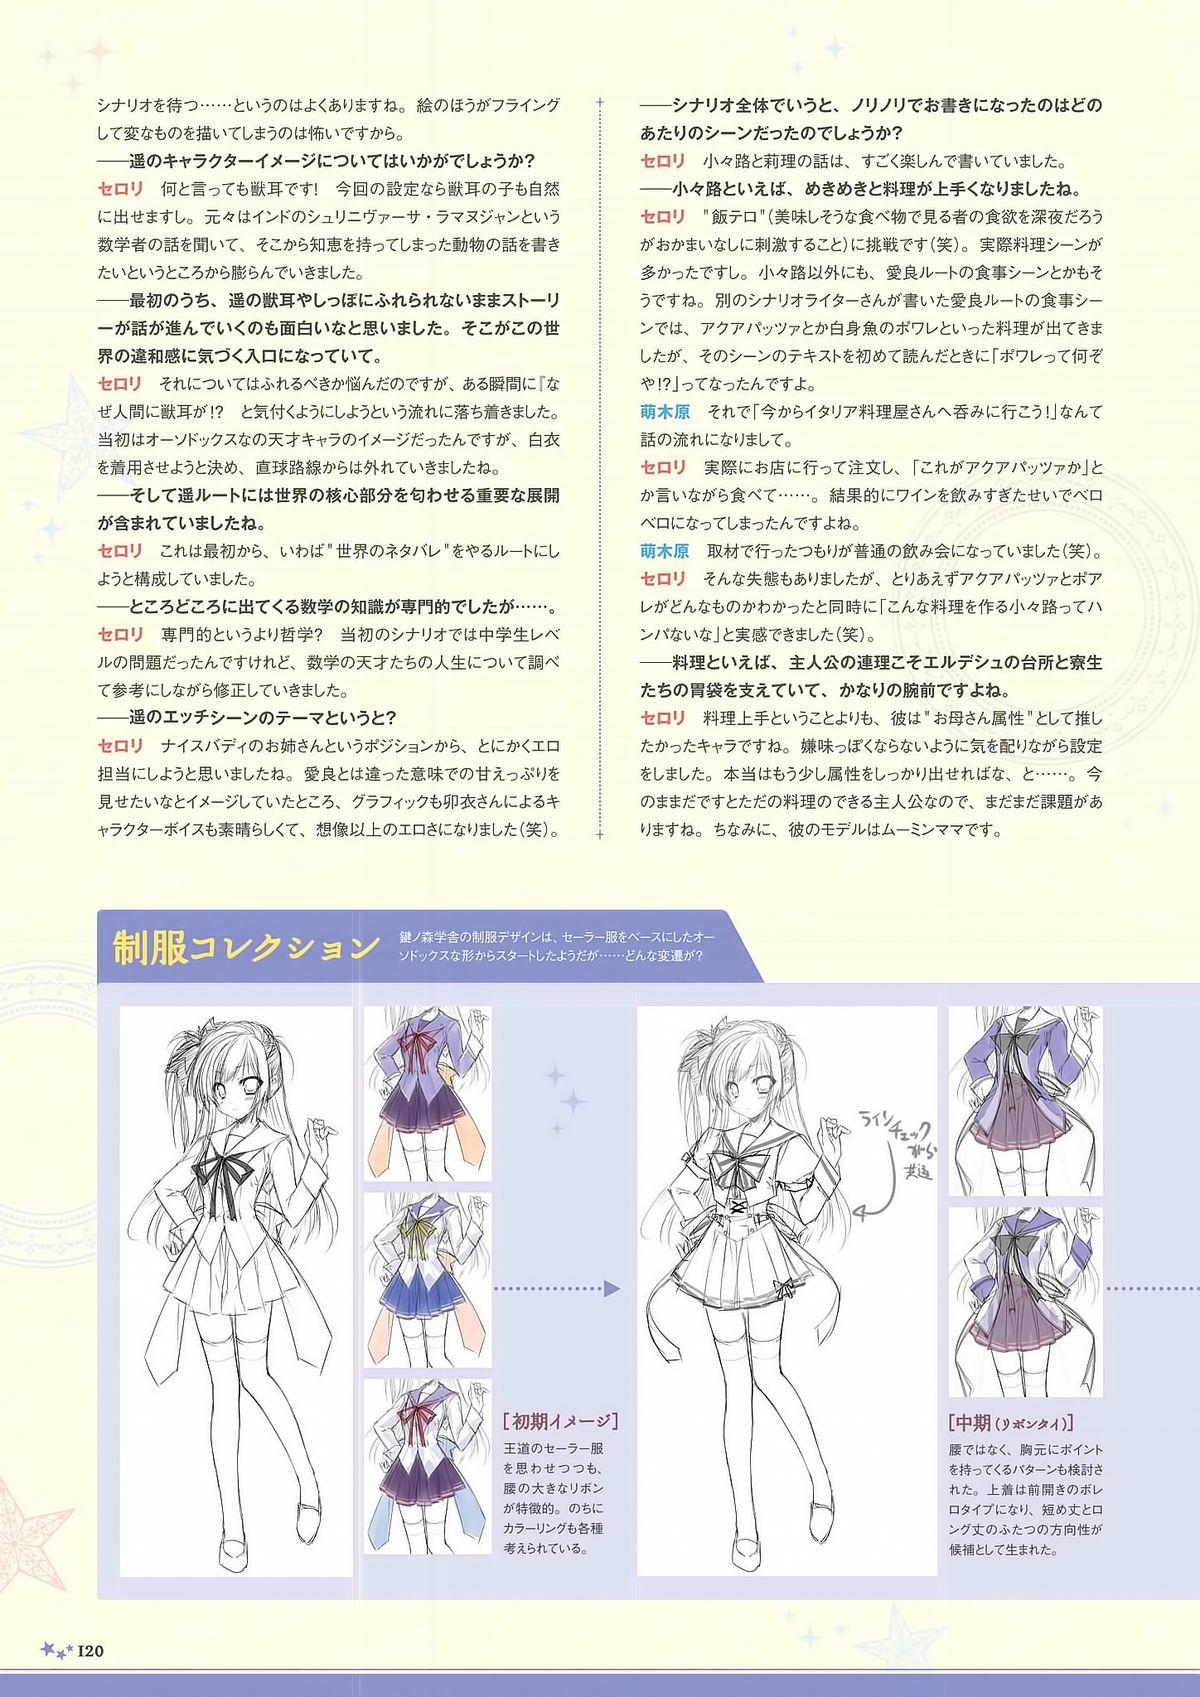 Sekai to Sekai no Mannaka de Visual Fanbook 117